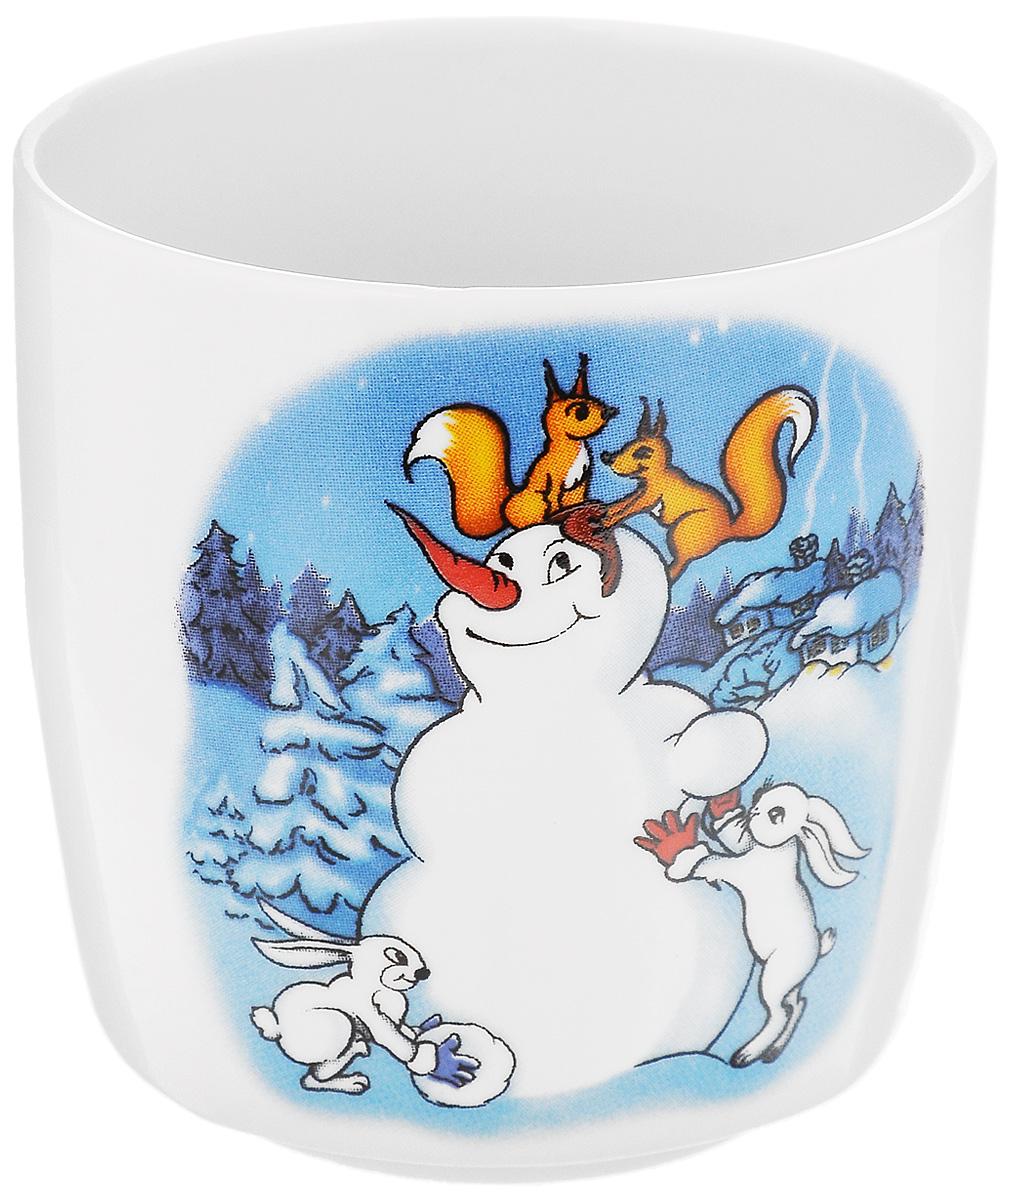 Стакан Фарфор Вербилок Снеговик с белками и зайчиками, 210 мл28782140_снеговик, белки, зайчики